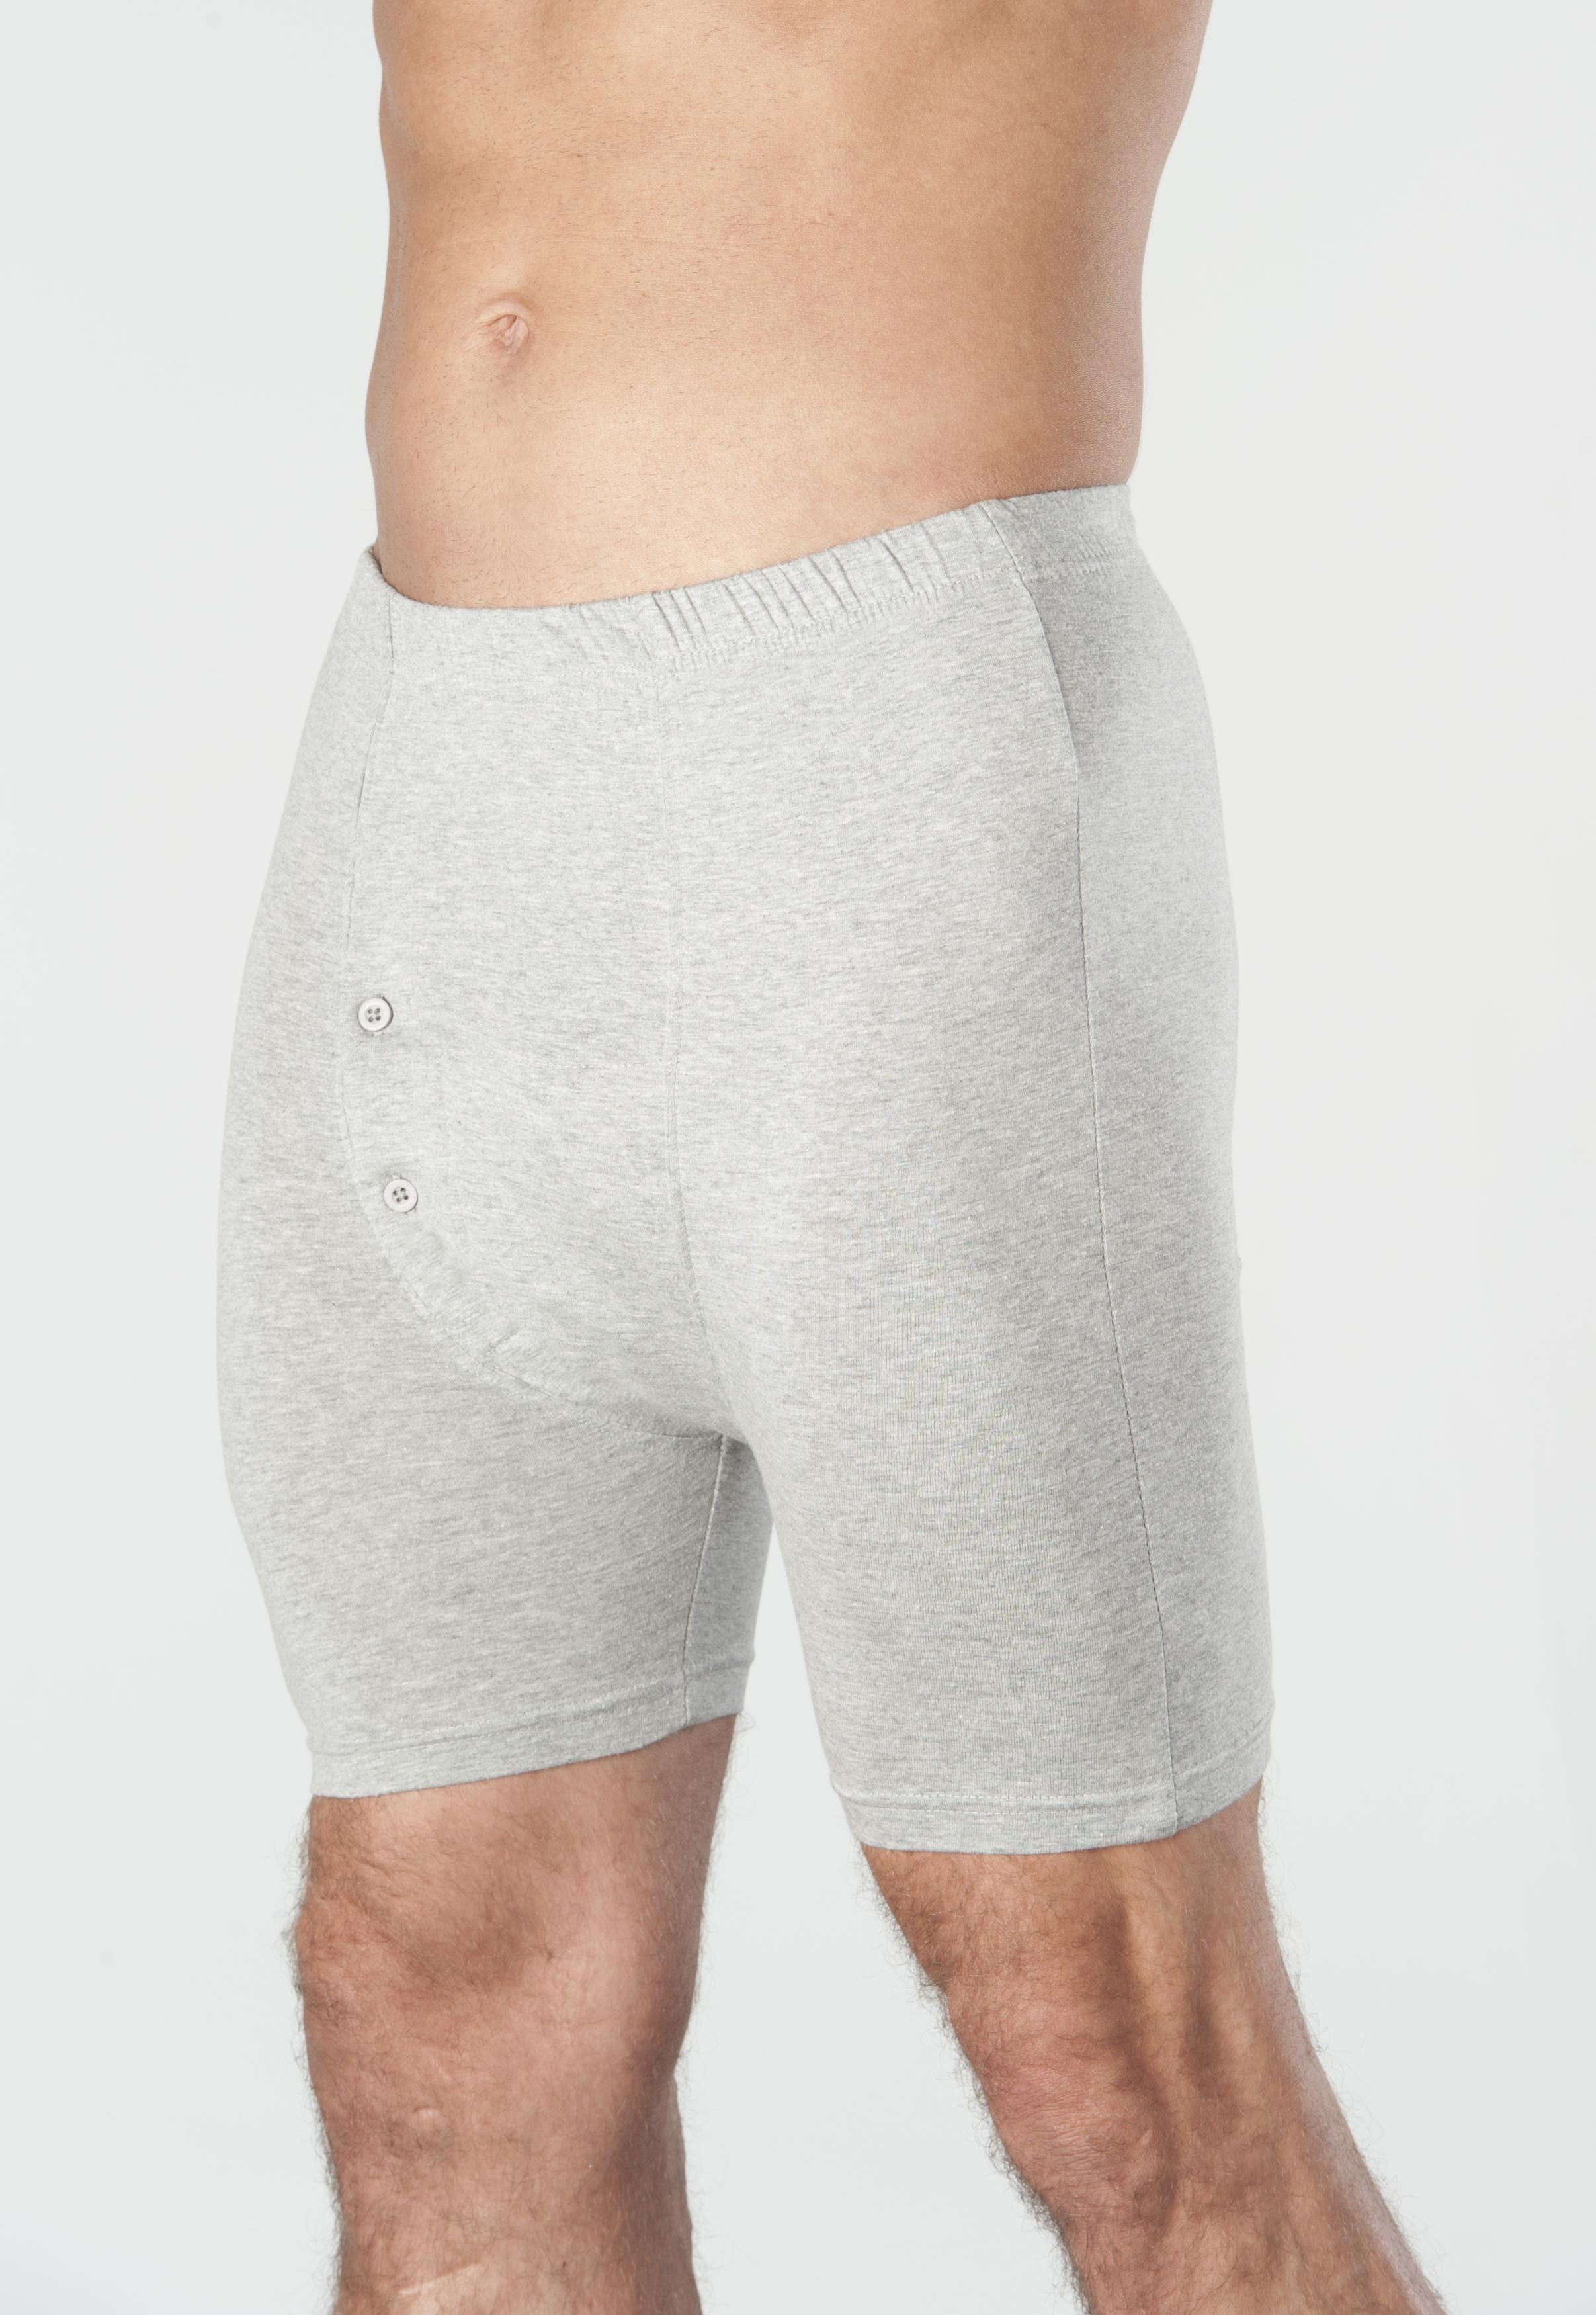 1-Pack Wearever Men's Incontinence Boxer Briefs Washable Reusable Bladder Control Underwear - Single